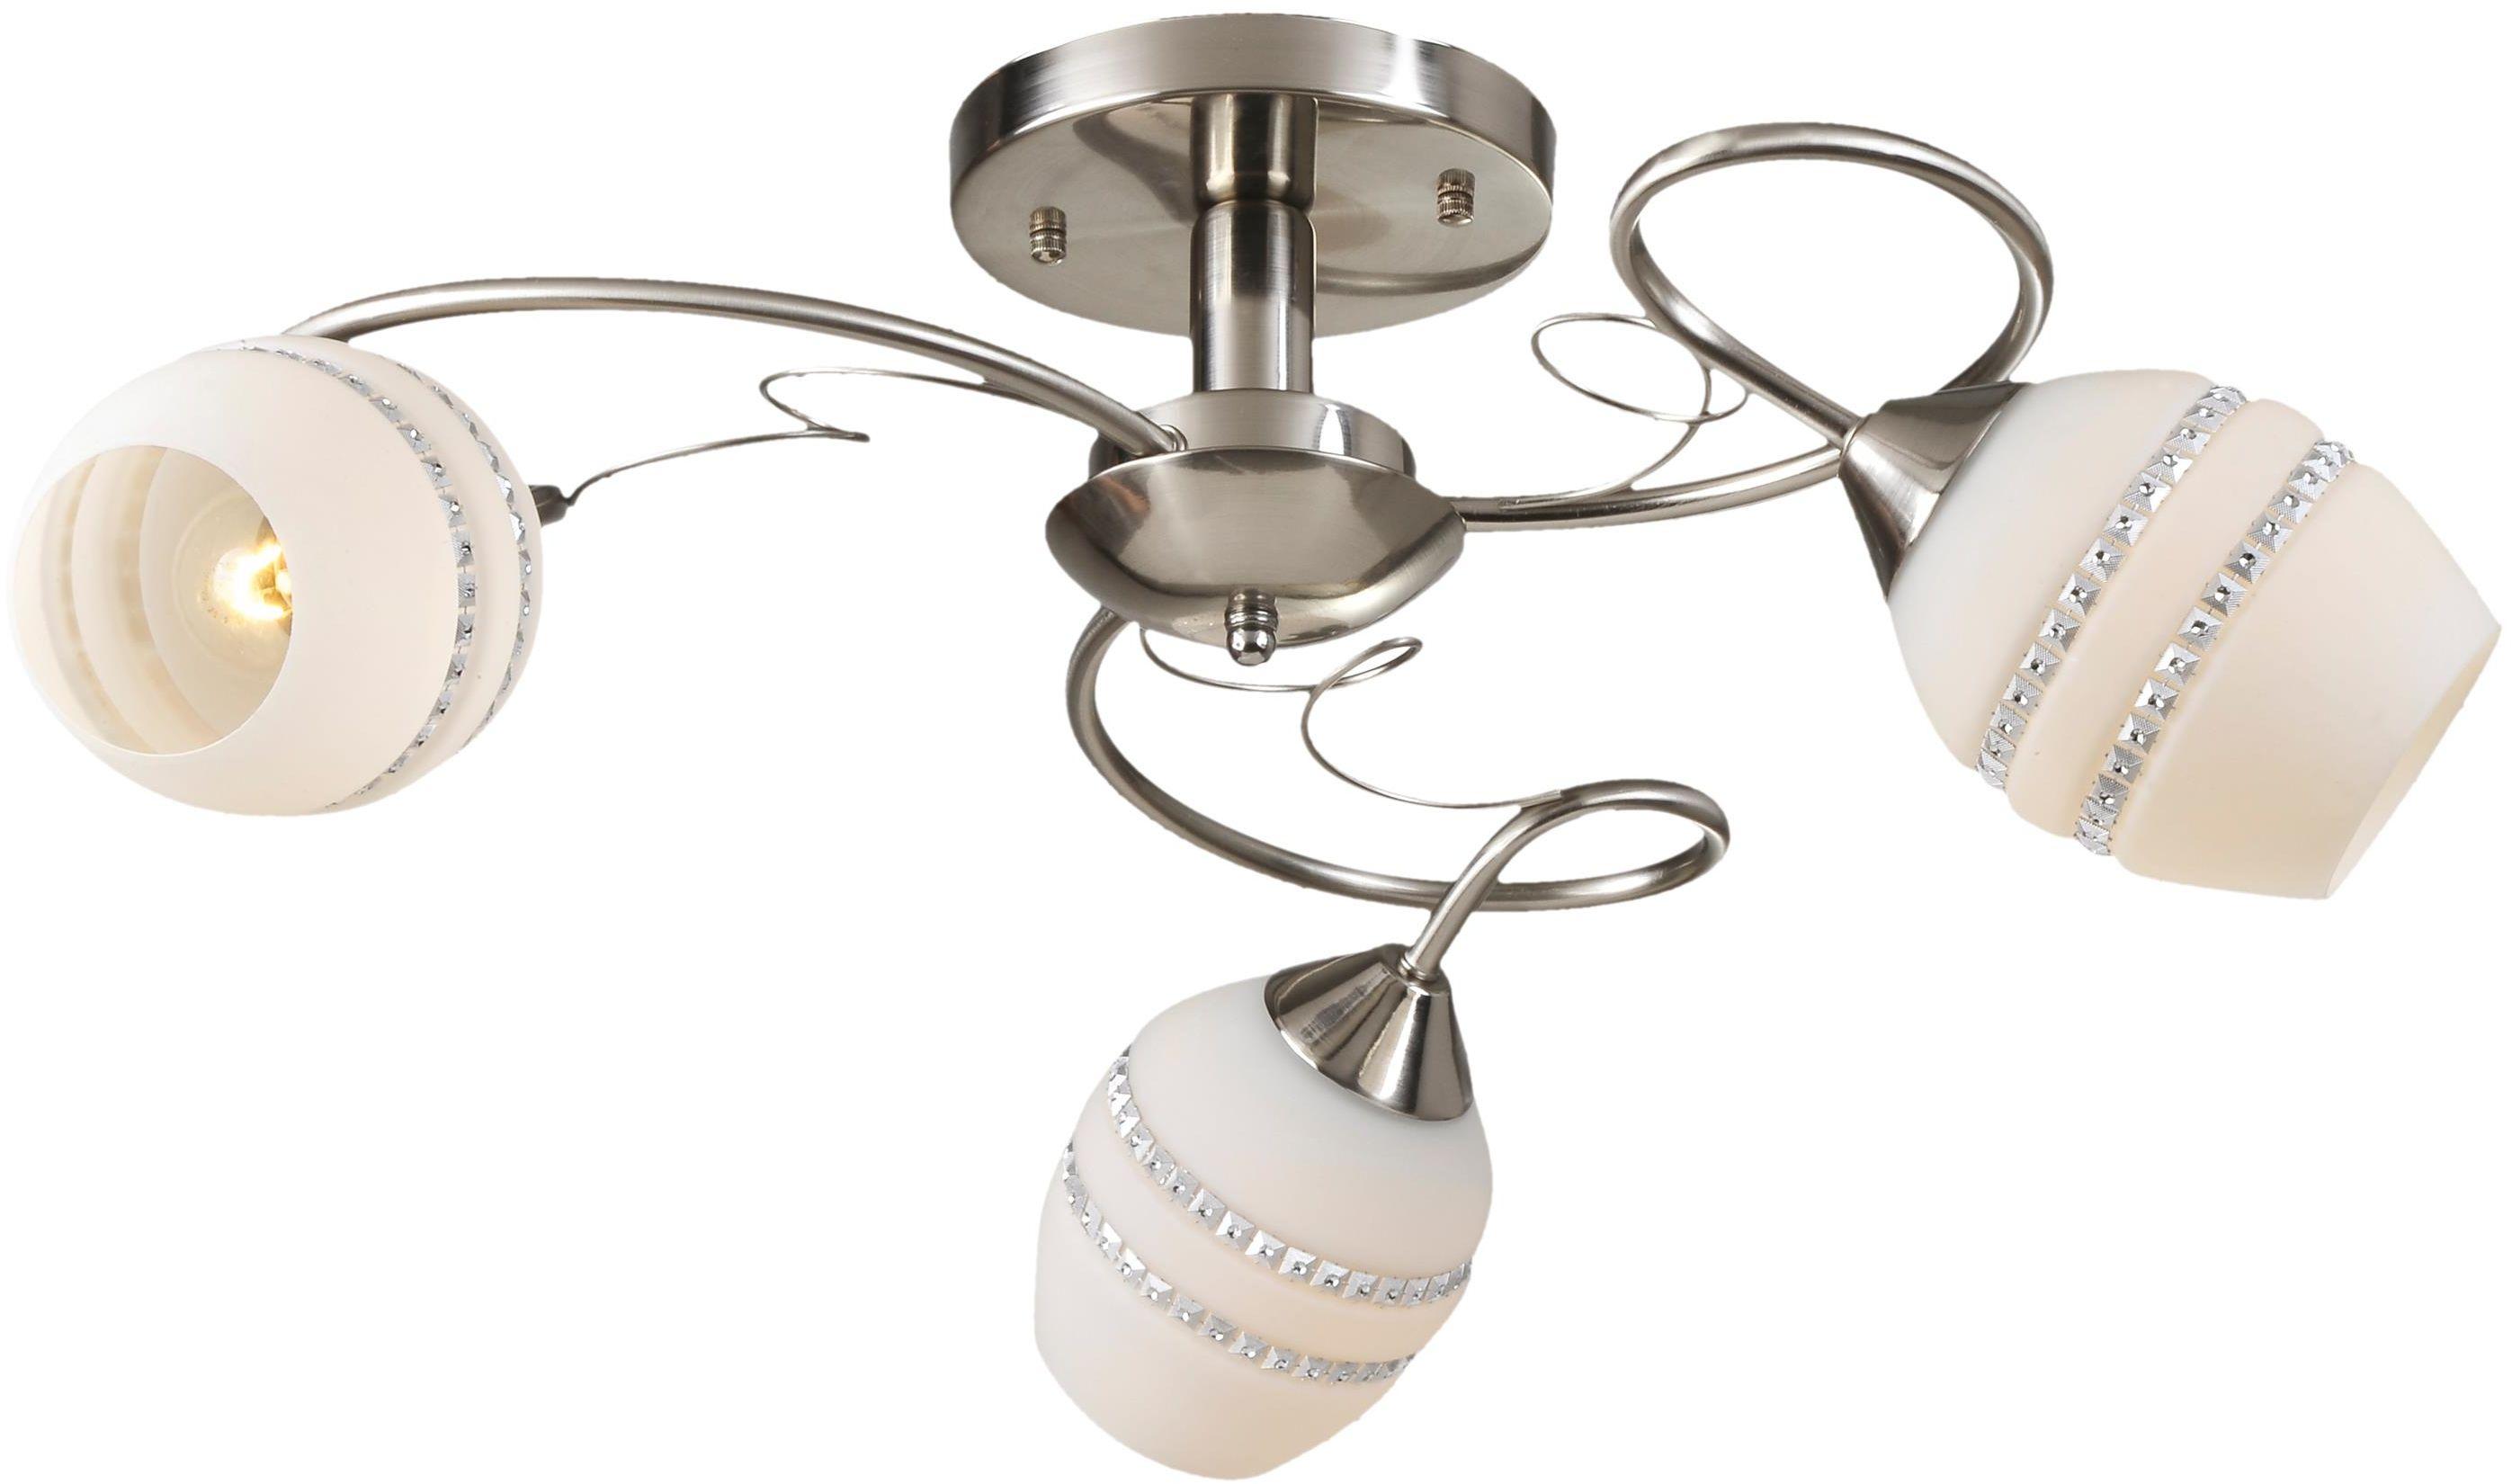 Lampex Beja 3 293/3 plafon lampa sufitowa klasyczna białe szklane klosze 3x60W E27 62cm